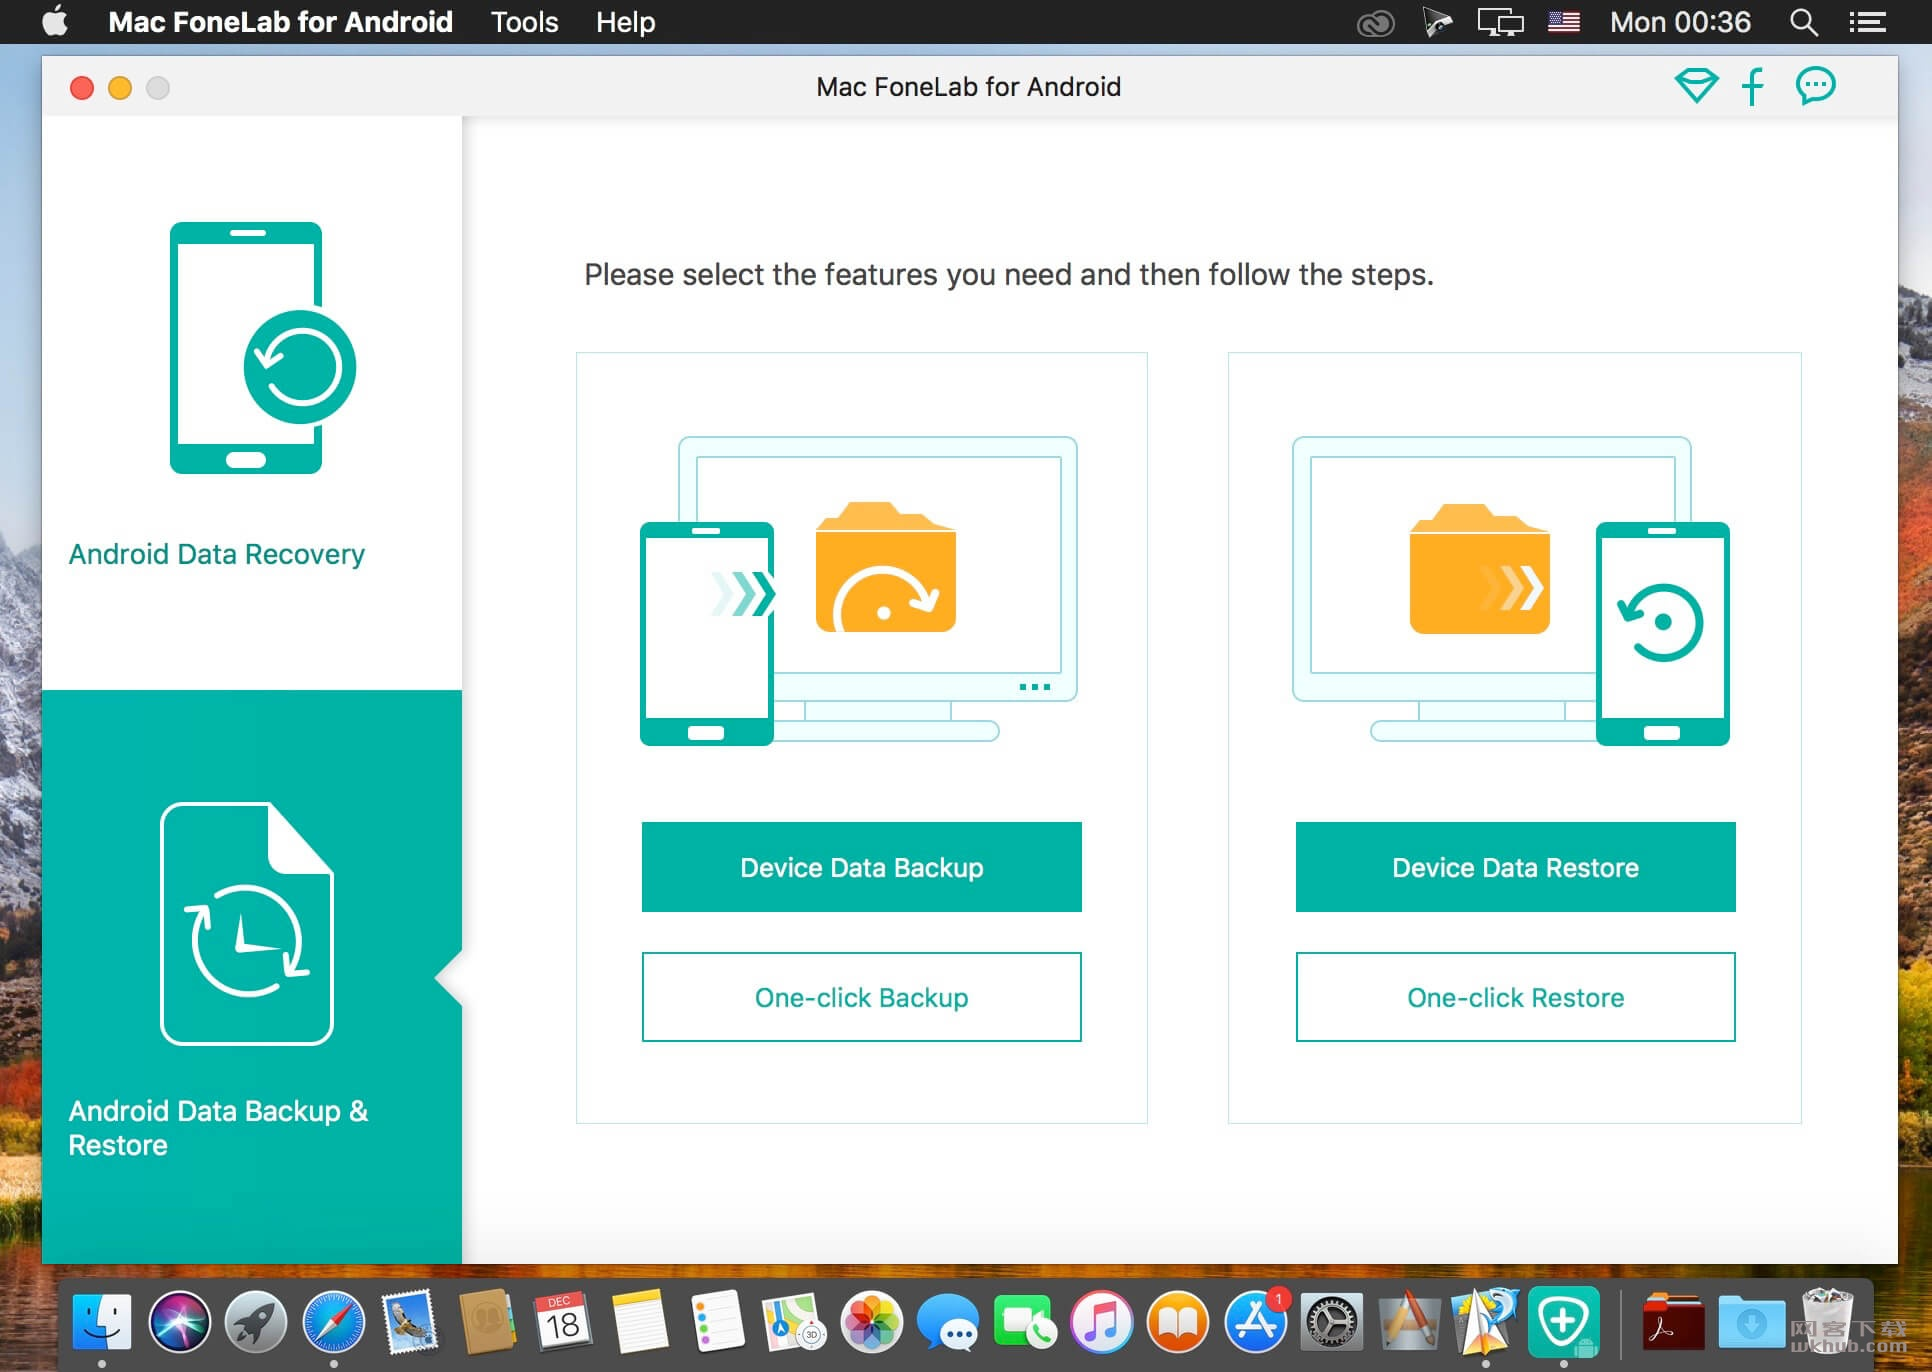 Mac FoneLab for Android 3.1.8.94325 安卓数据恢复工具